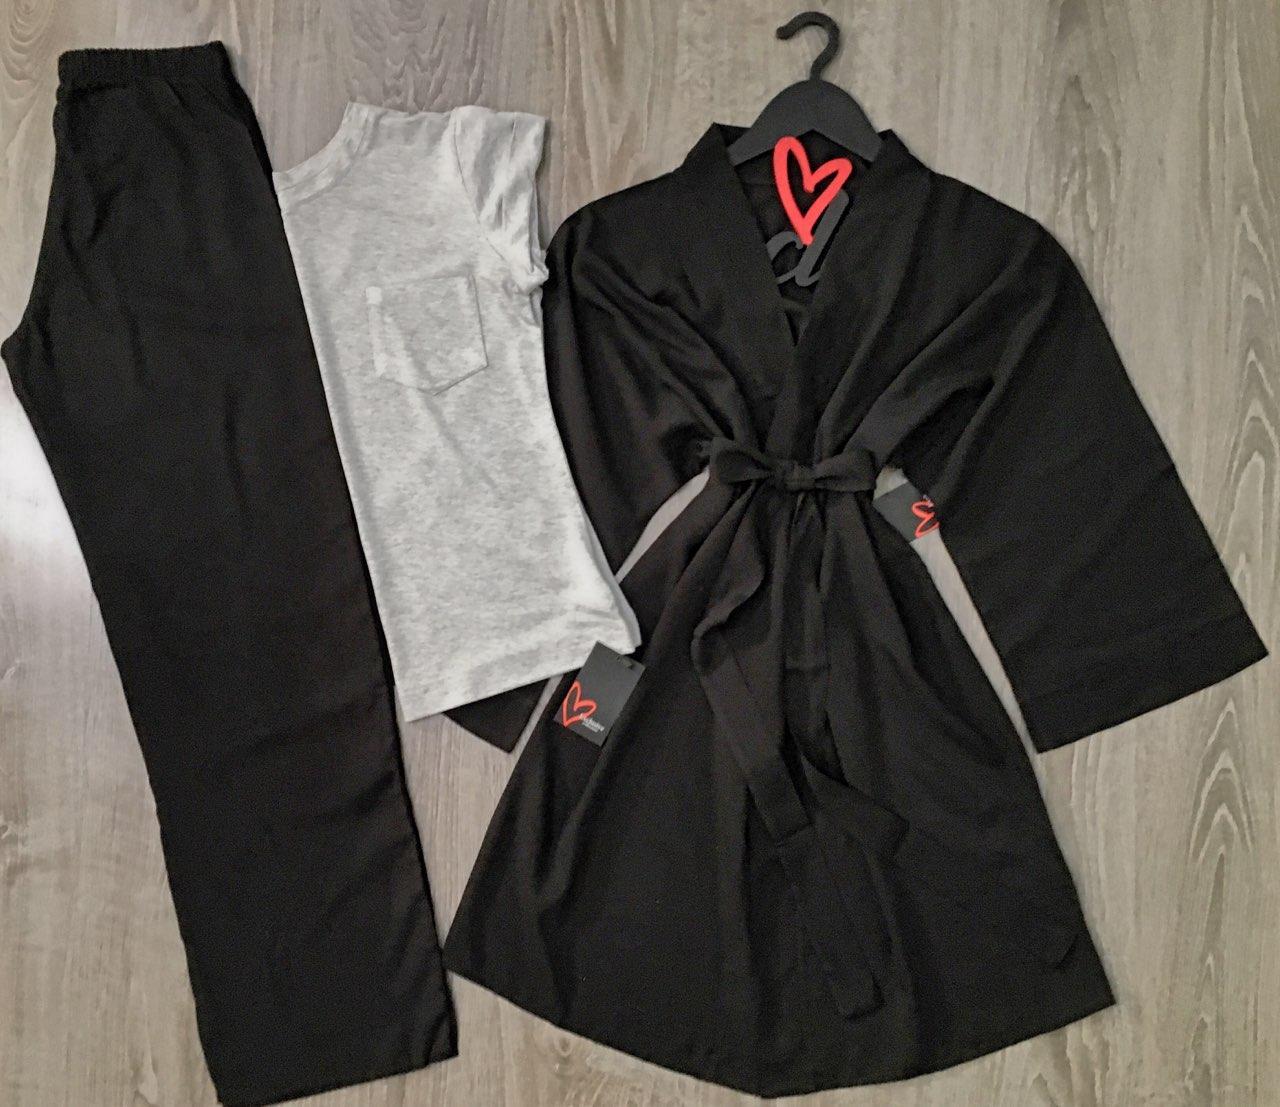 Хлопковый комплект для дома, халат+ футболка+штаны